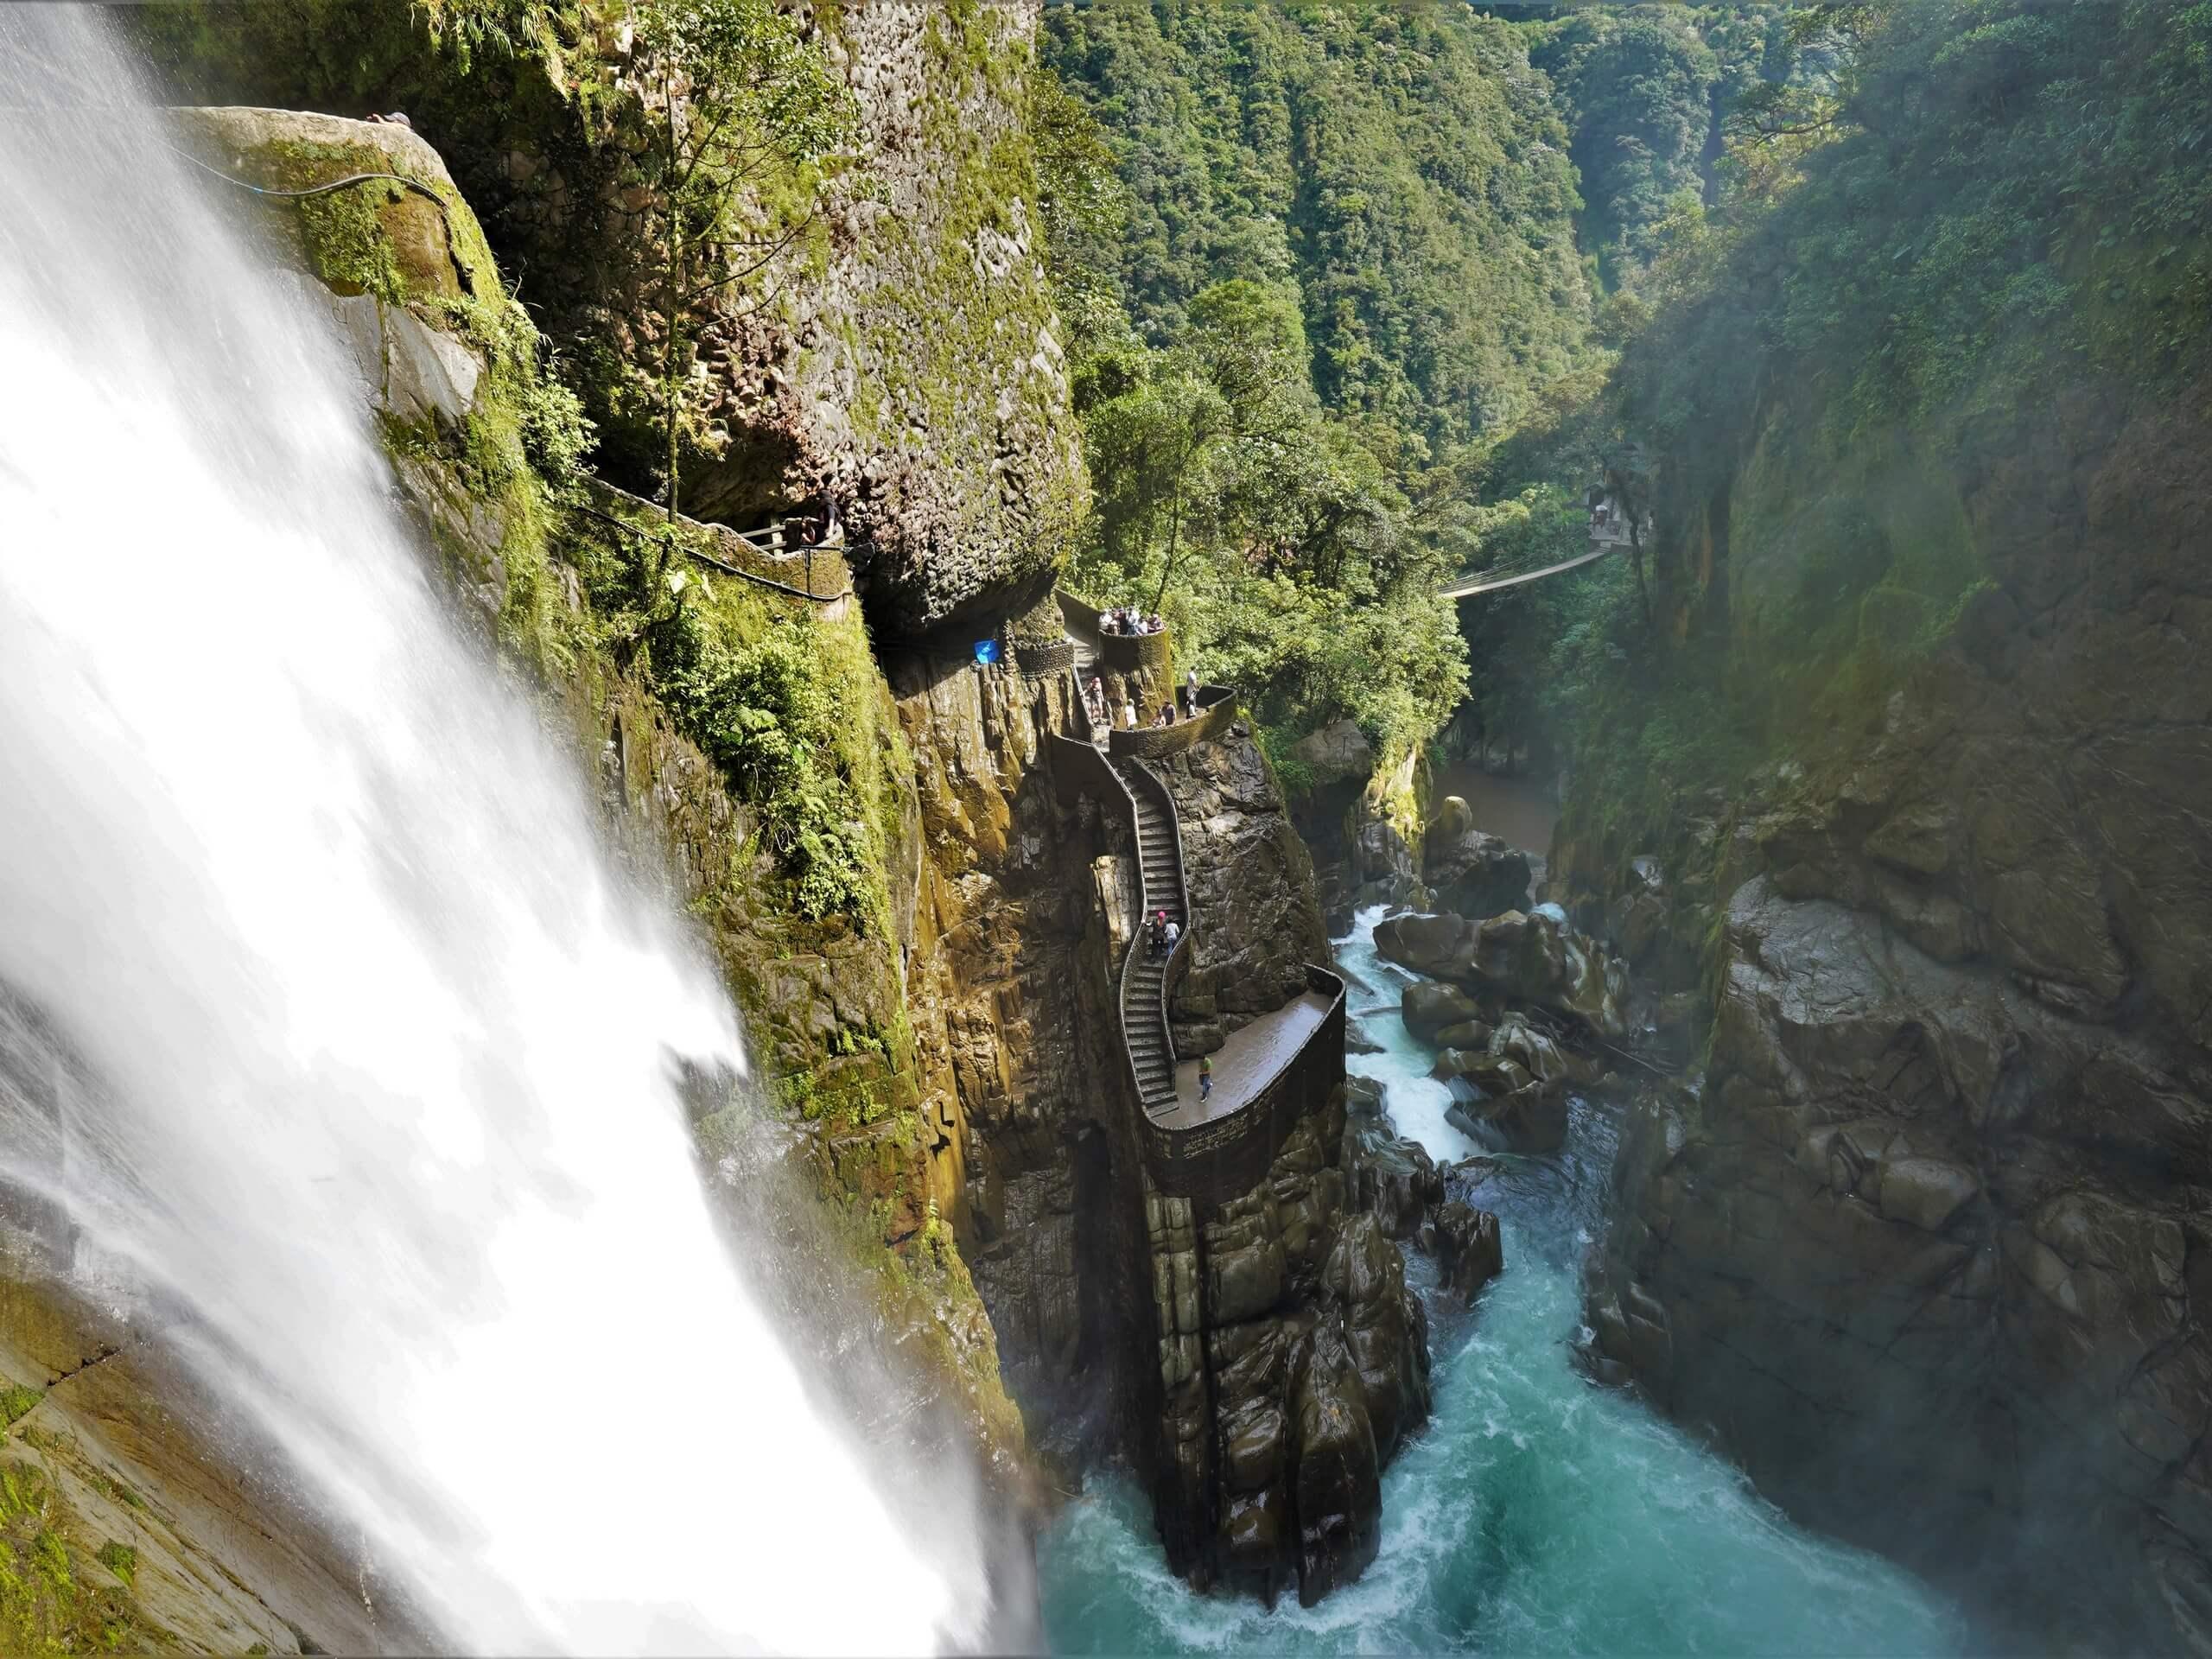 Huge waterfall near the staircase in Ecuador